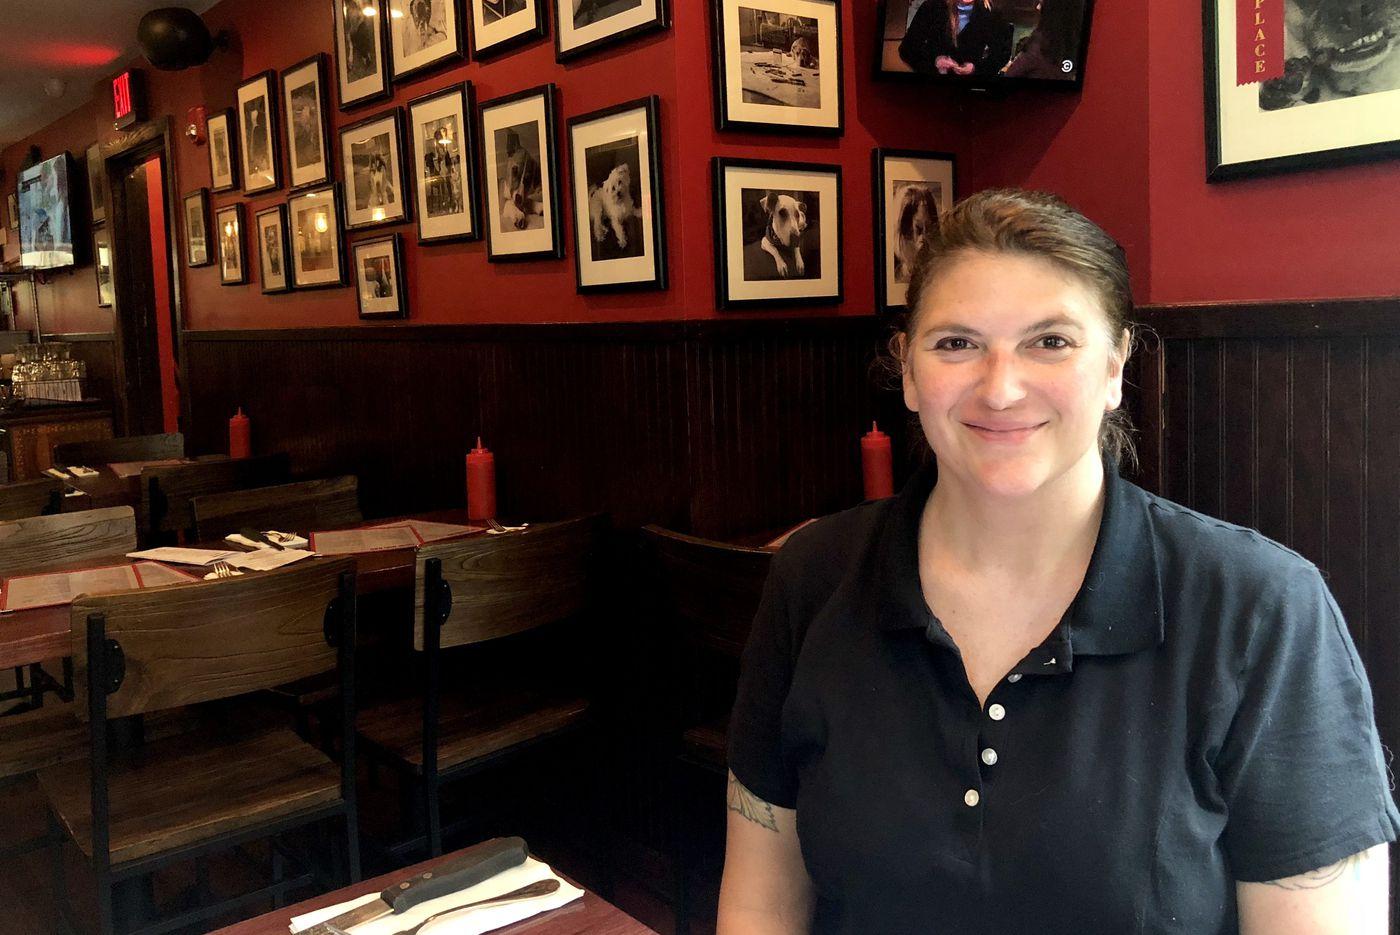 Carolynn Angle is new chef at Good Dog Bar in Center City